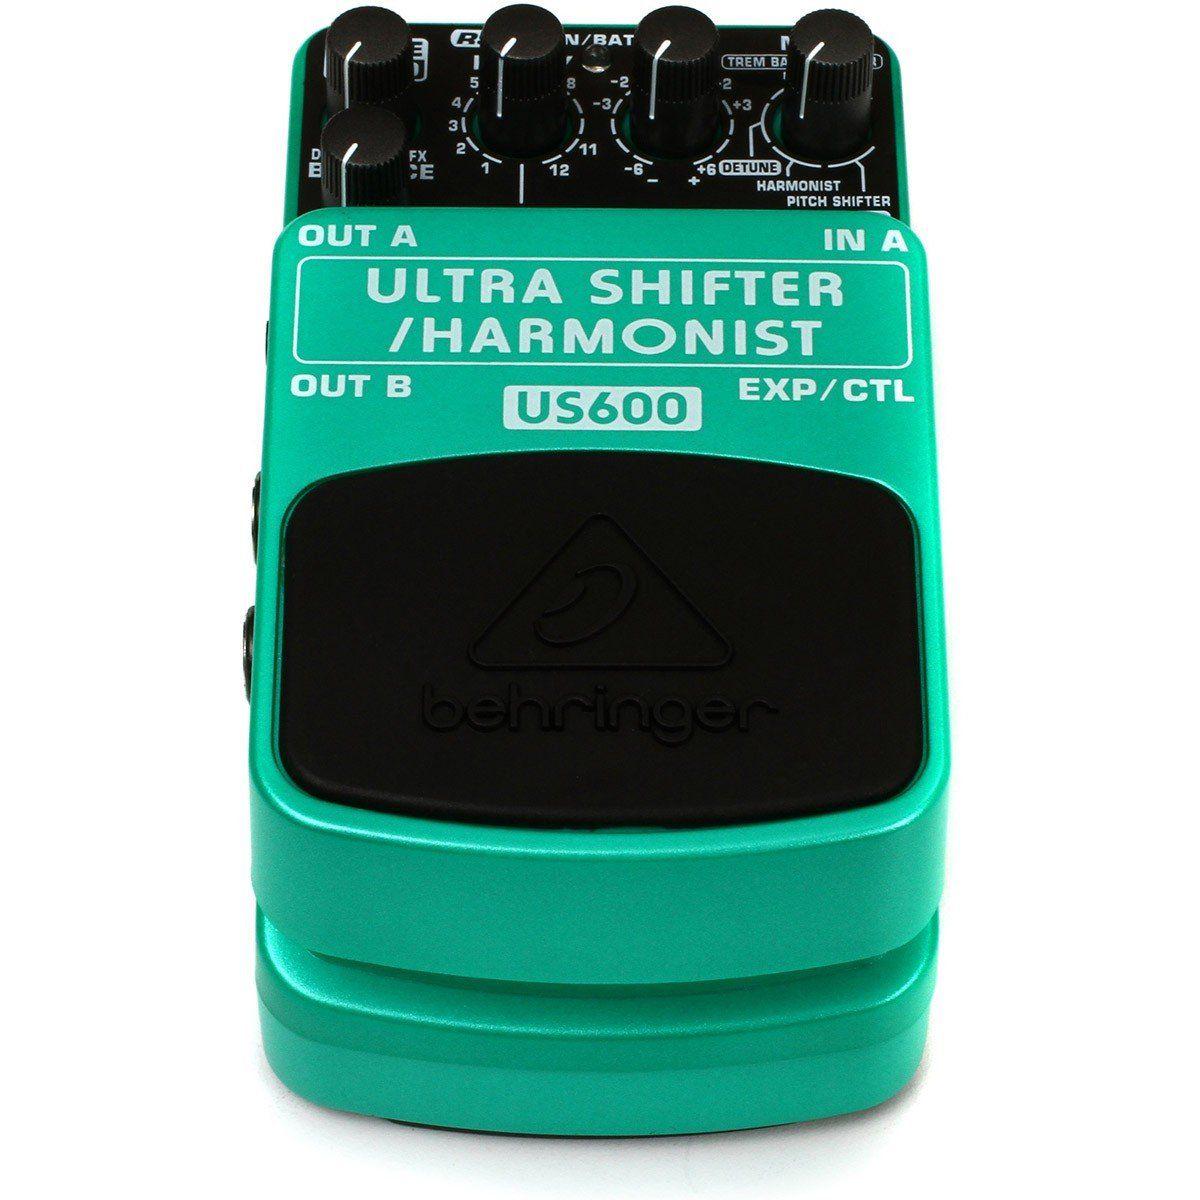 Behringer US600 Ultra Shifter Harmonist Pedal para Guitarra Performances Home Studio